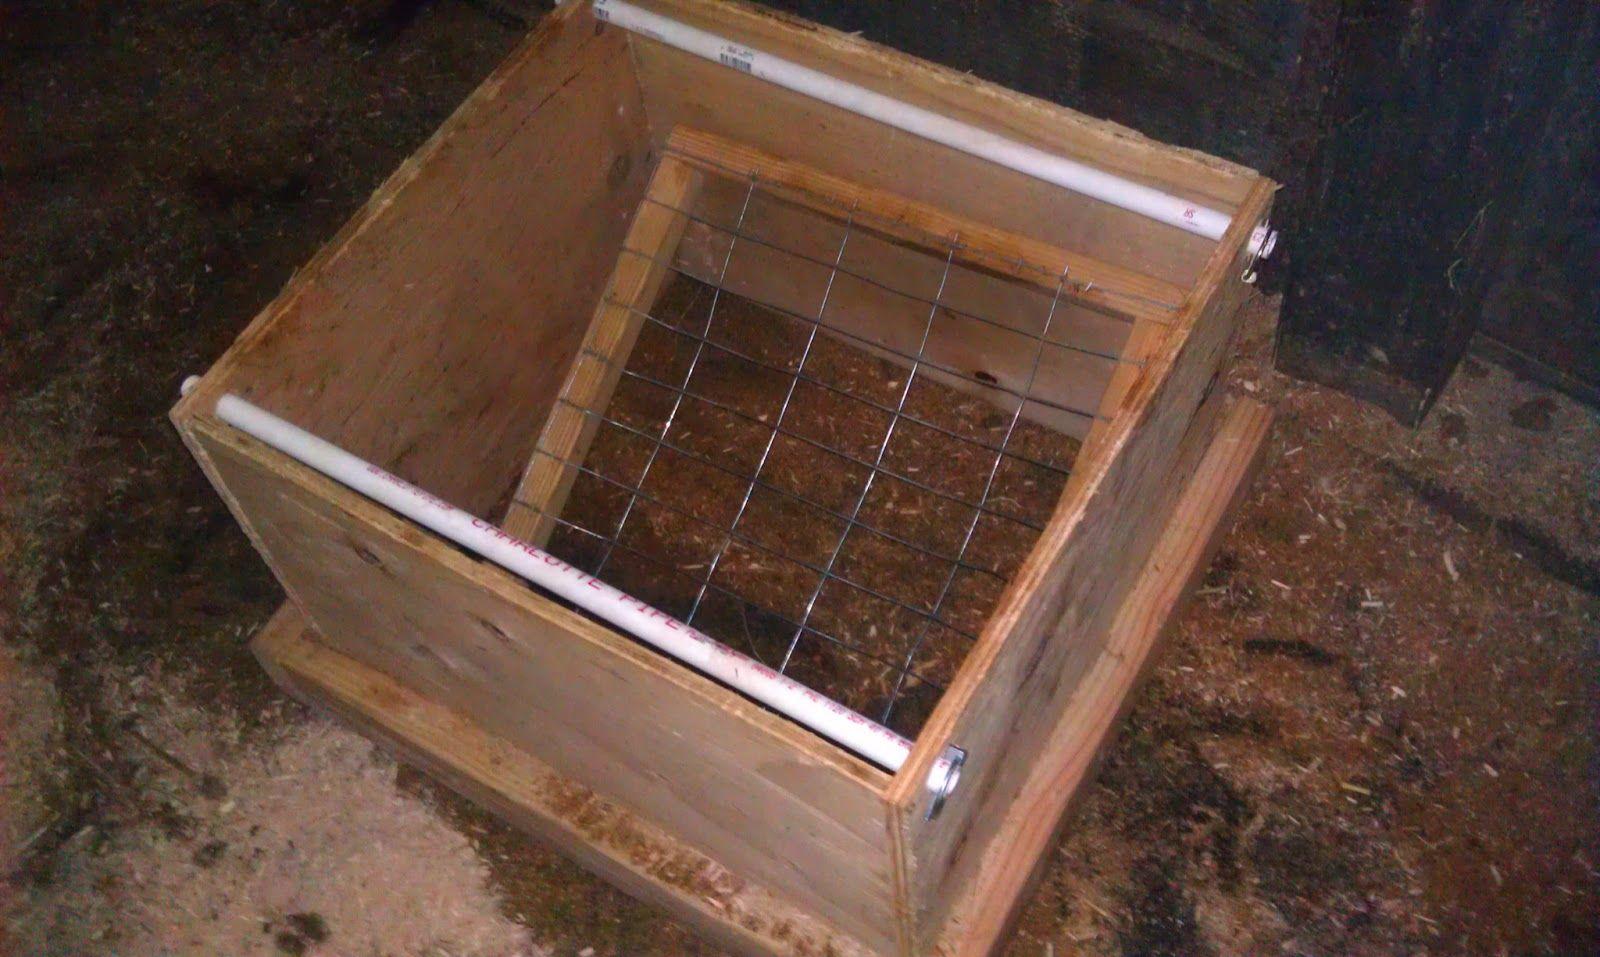 Slow Feeder Hay Box Barn Slow Feeder Horses Horse Care